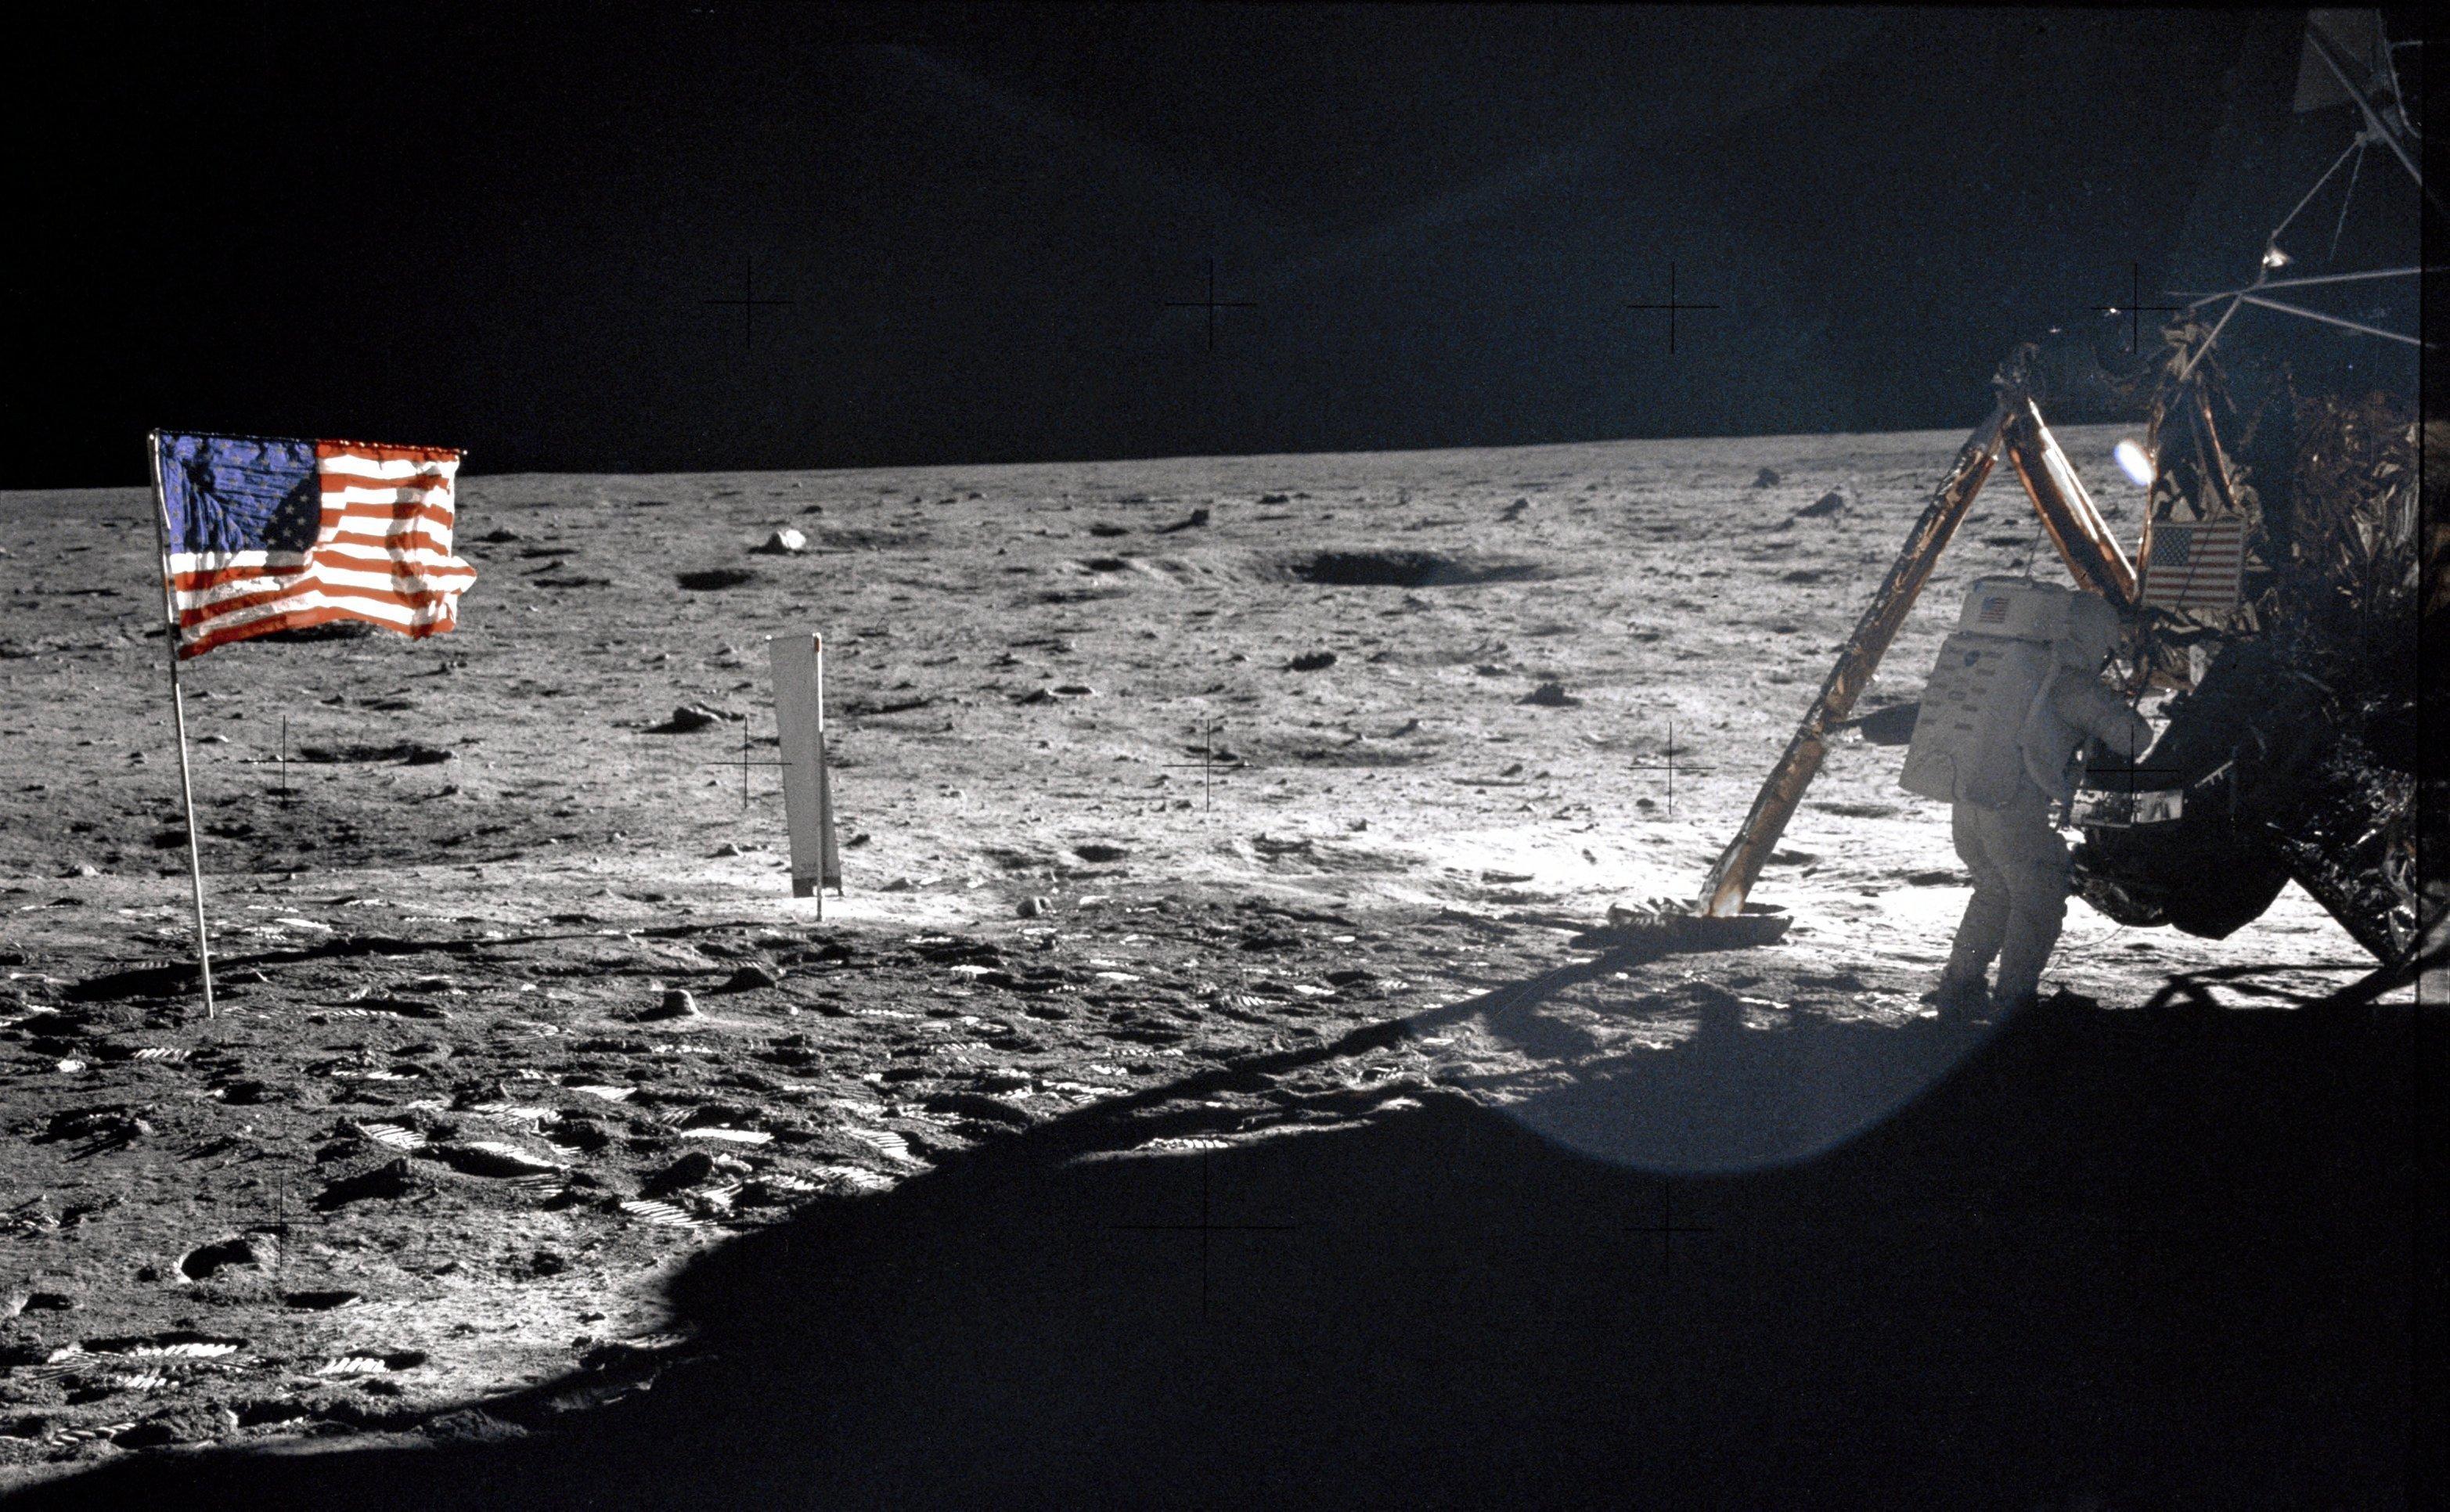 Американцы на луне картинка